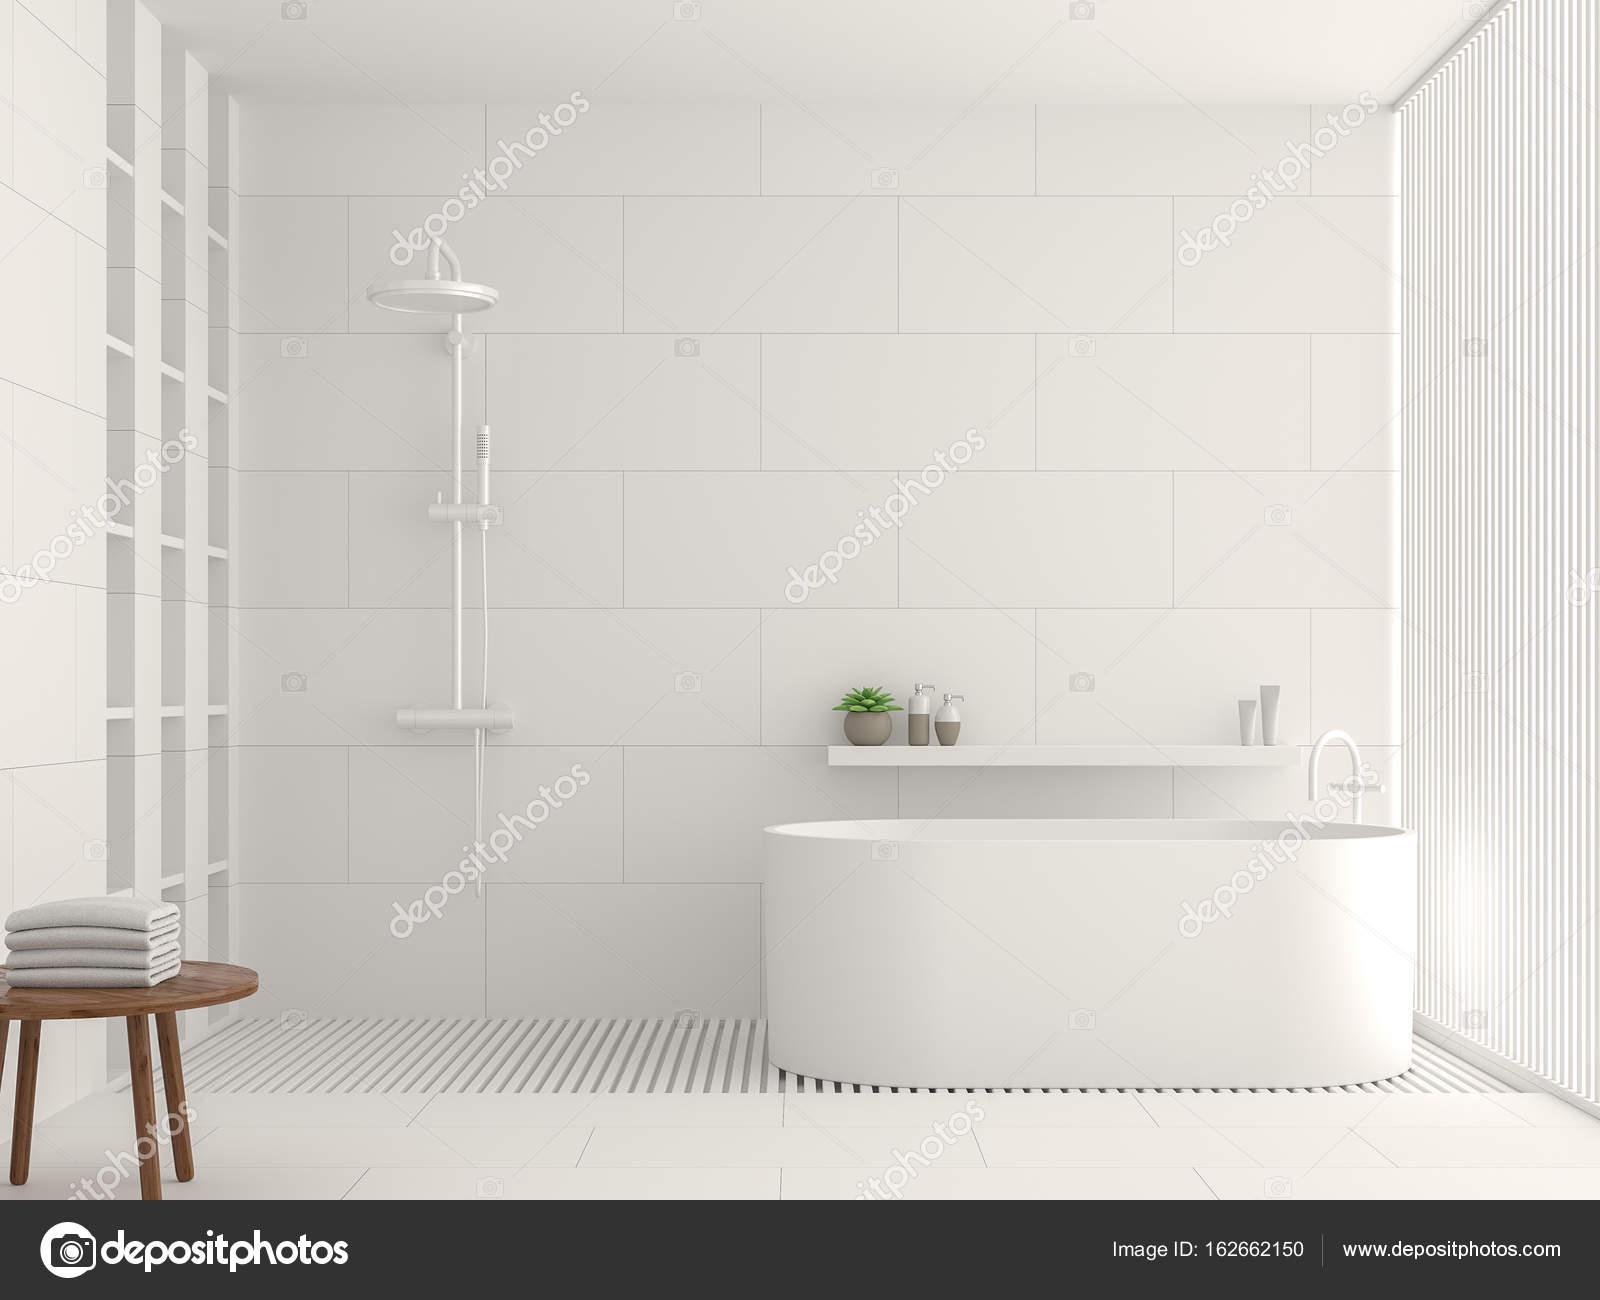 Moderne Witte Badkamer : Moderne witte badkamer interieur 3d rendering afbeelding u2014 stockfoto